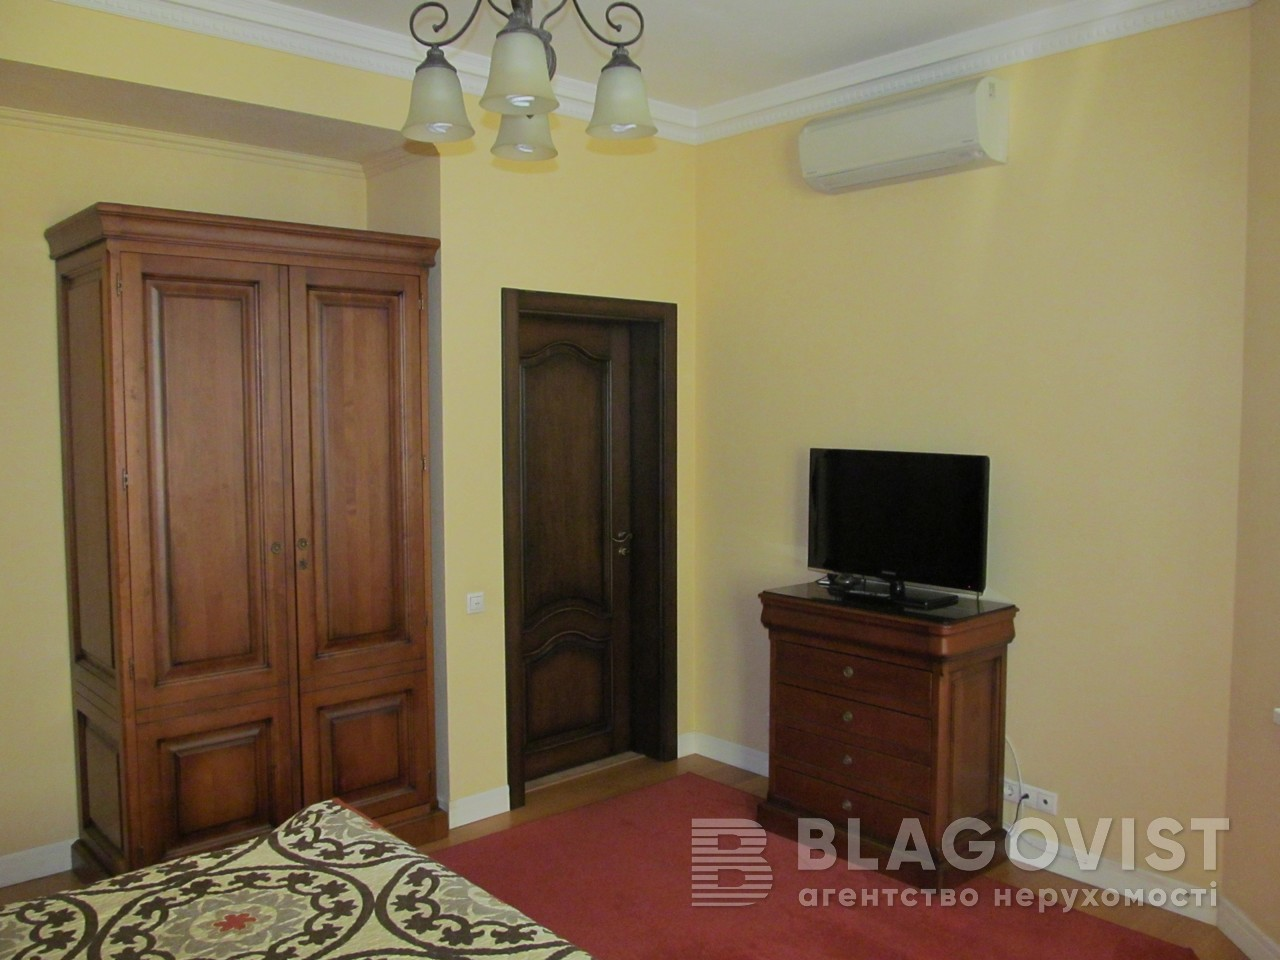 Квартира R-11655, Несторовский пер., 6, Киев - Фото 11